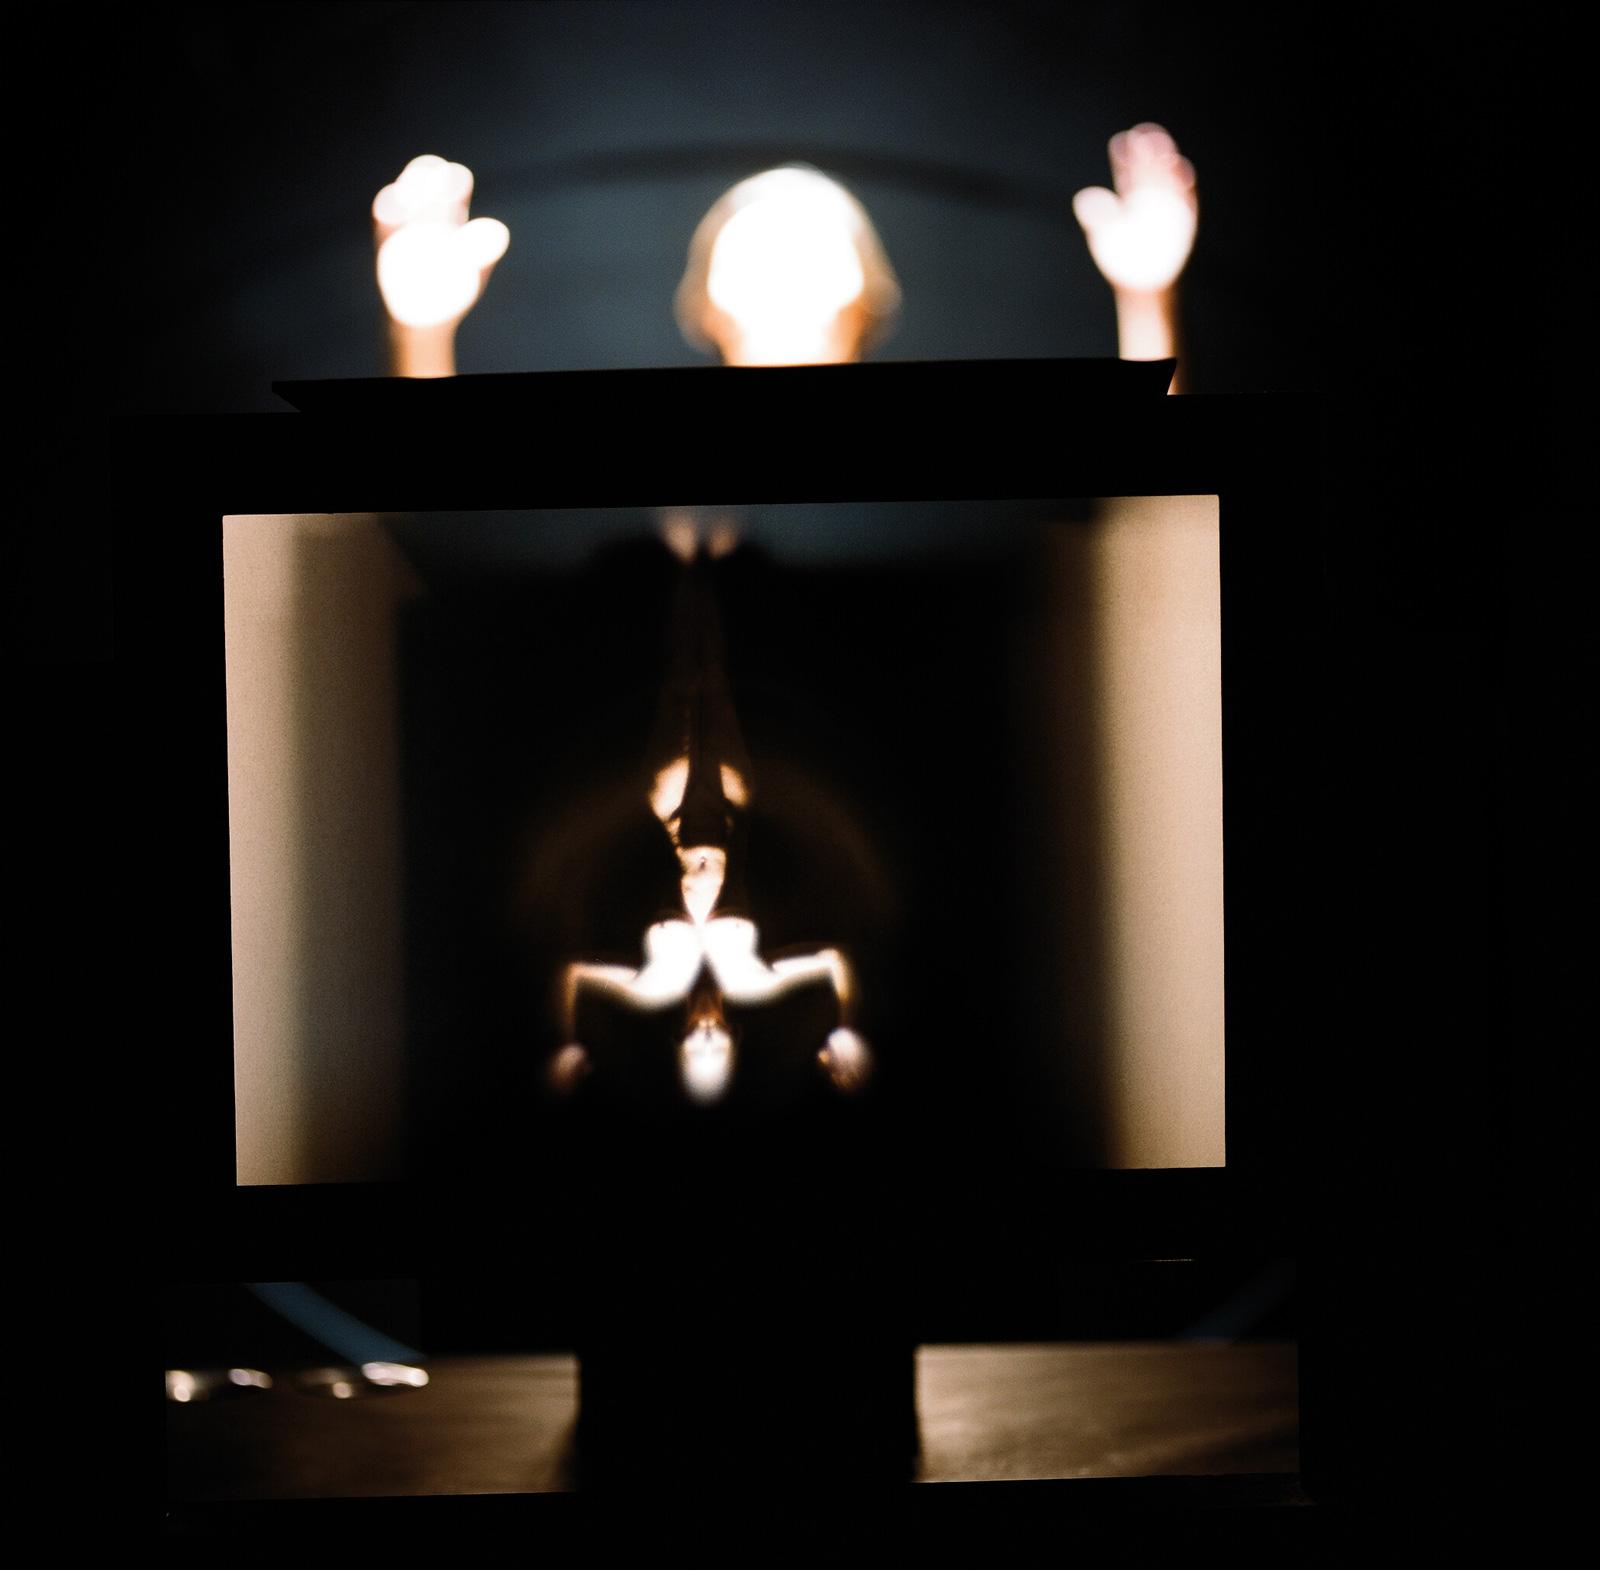 LA SEMILLA DE LA IMAGEN I serie XVII. Fotografía analógica, 2009